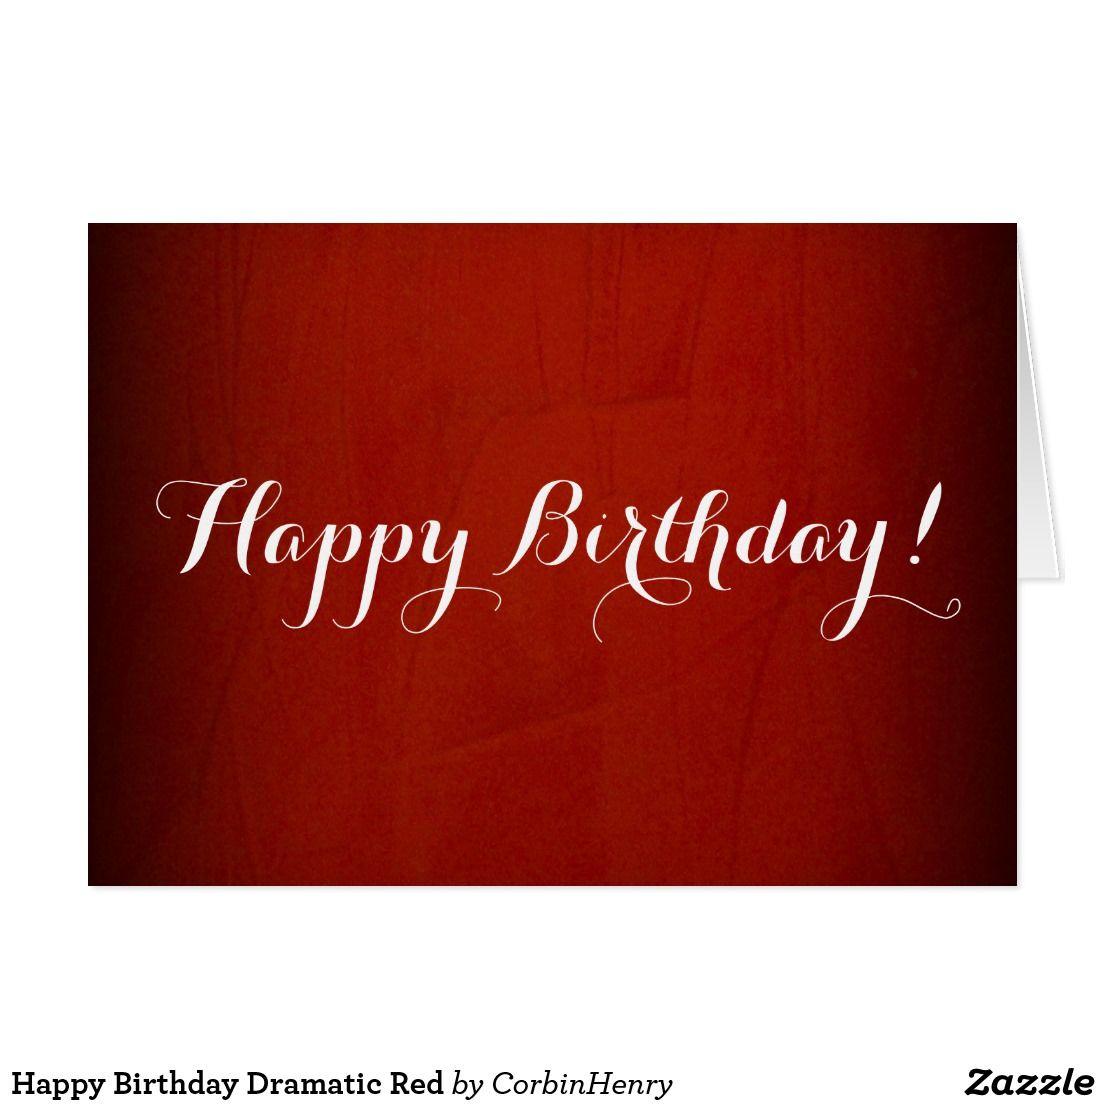 Happy Birthday Dramatic Red Card  Zazzle.com in 5  Happy